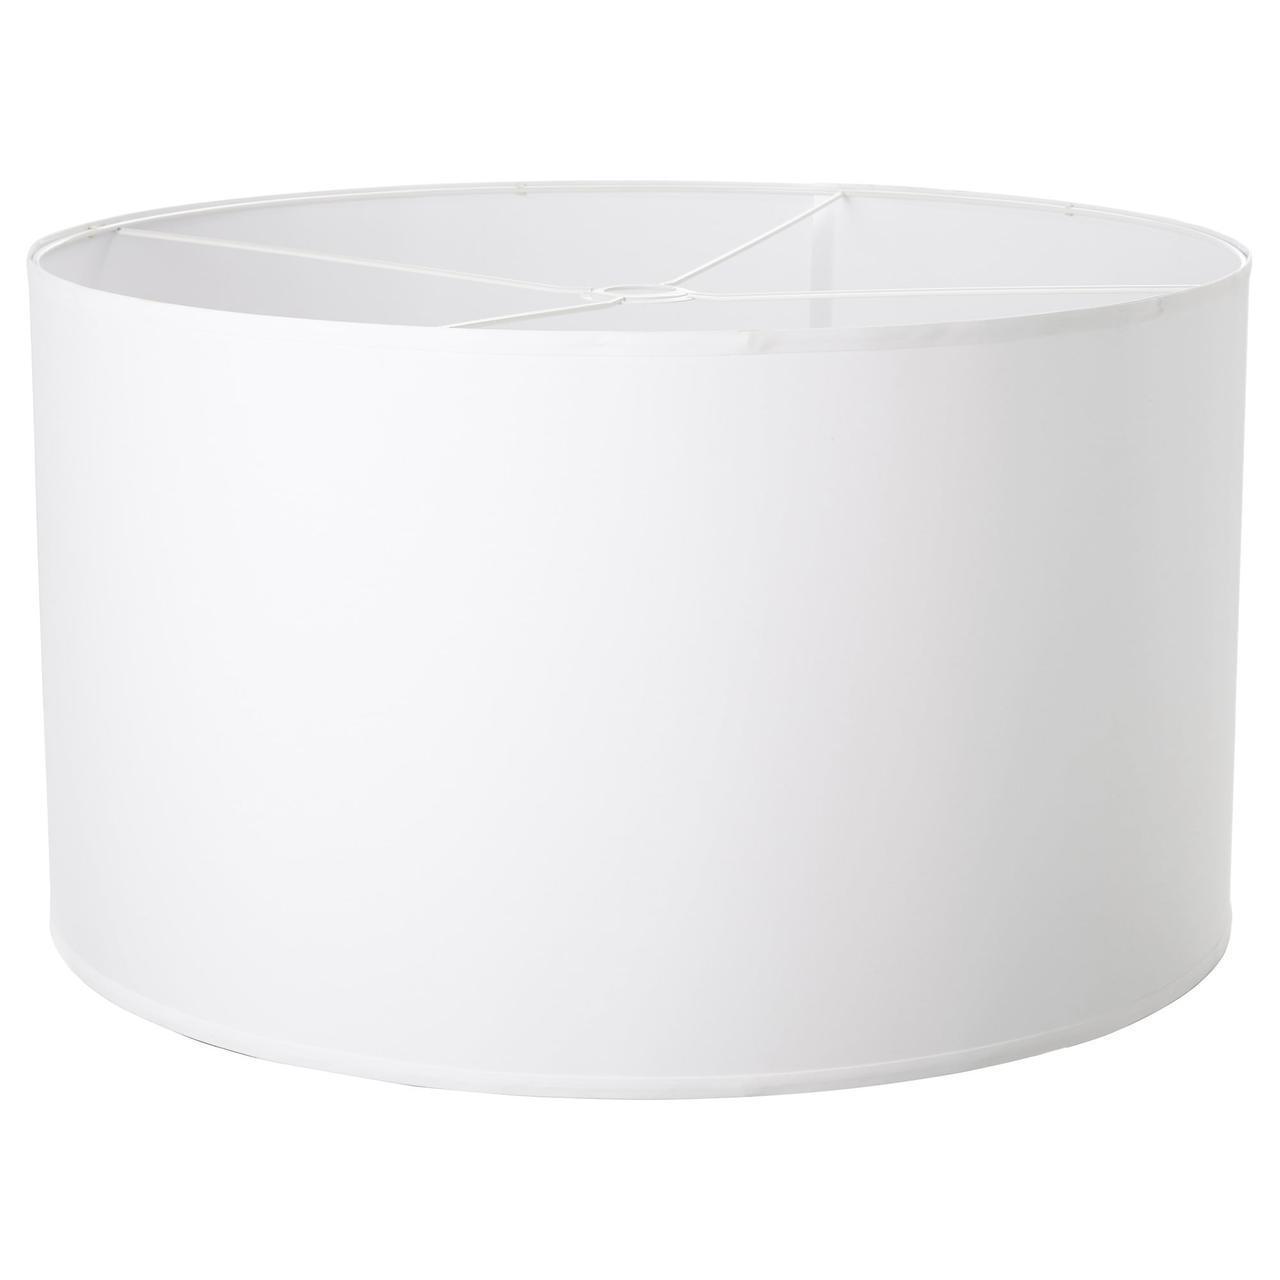 Абажур (плафон) для лампы IKEA NYMÖ 70 см белый 002.564.92